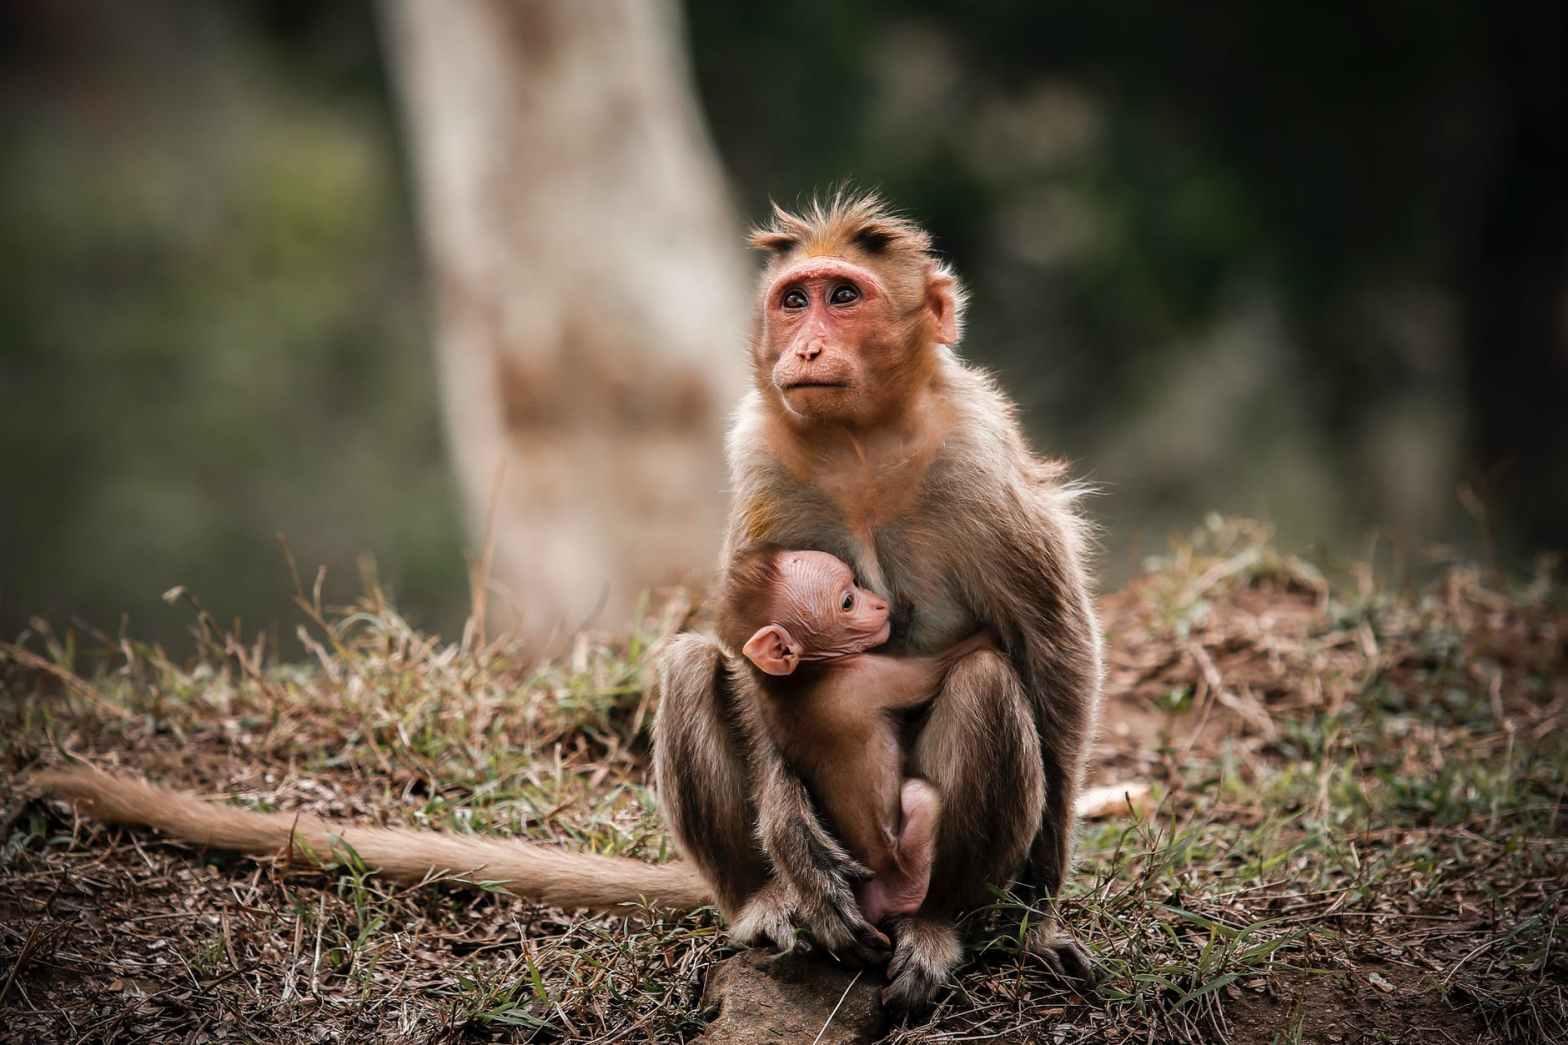 monkeys sitting on ground near tree